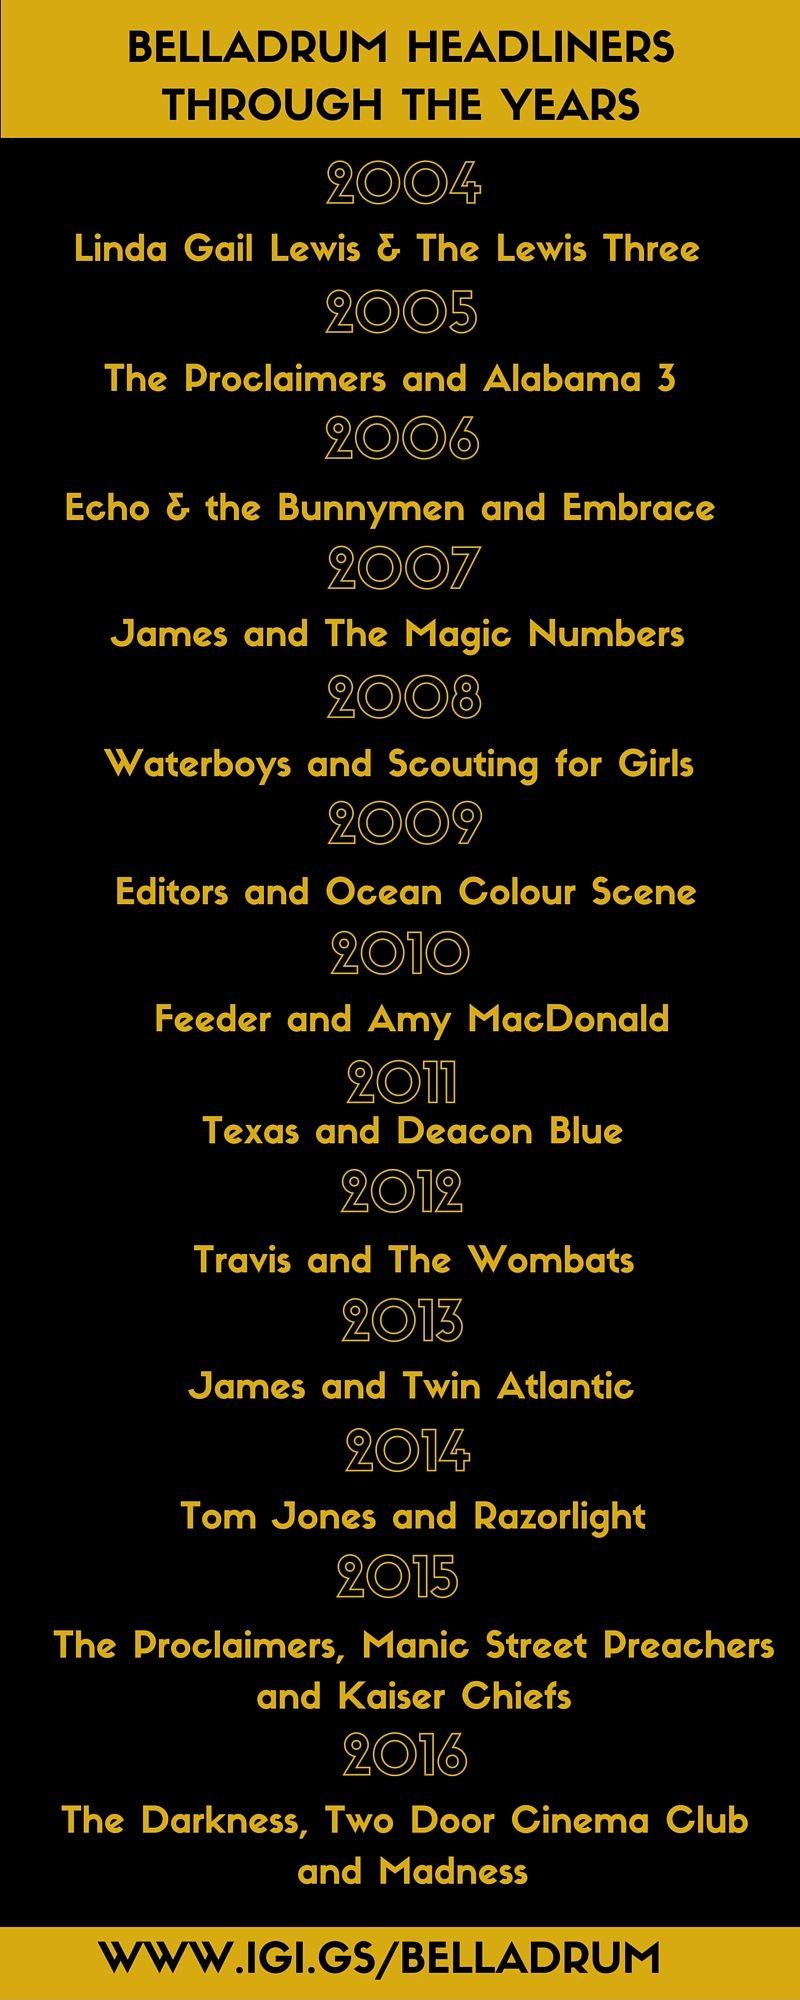 90 - Belladrum Festival Headliners from 2004